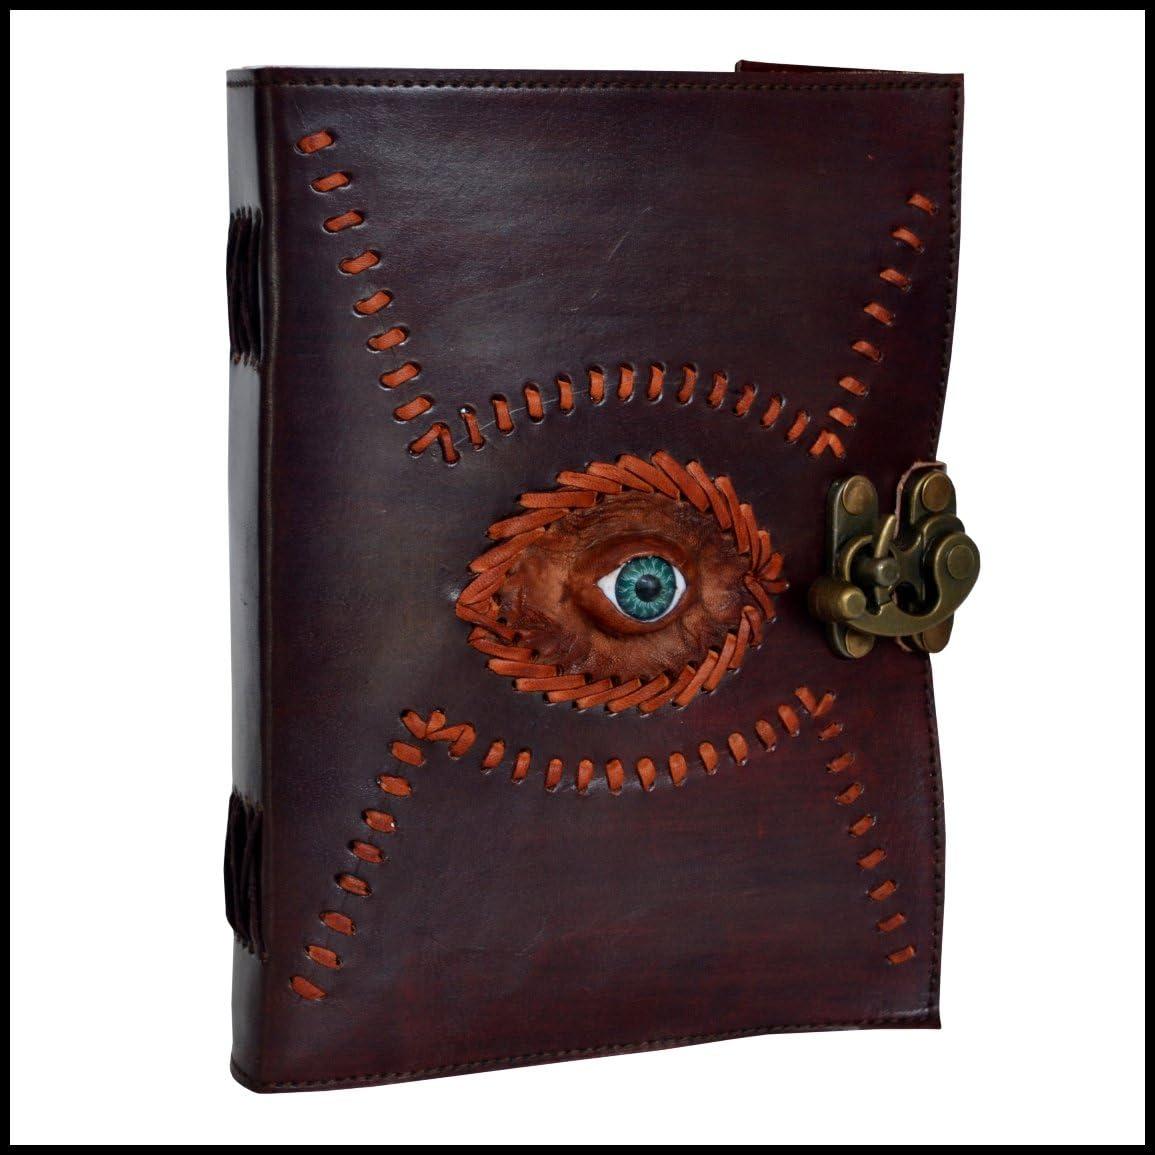 Leather Journal Book High material Gods Eye Personal Organiz Max 76% OFF Embossed Handmade